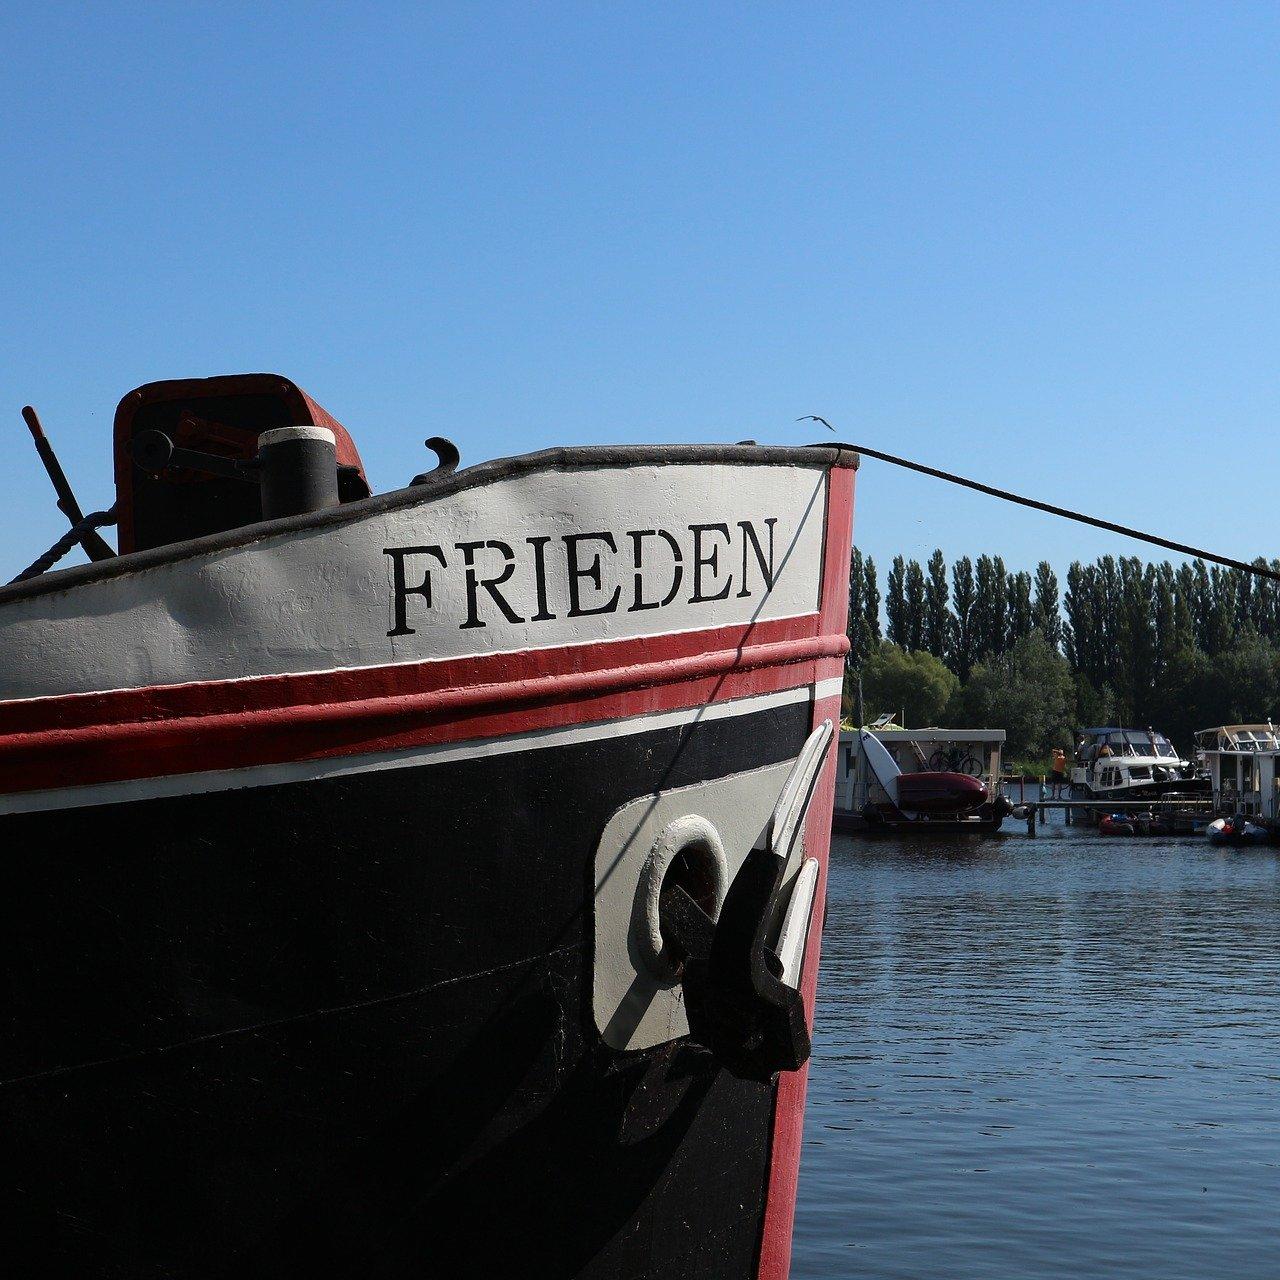 On tour mit dem Hausboot. Entspannung pur!